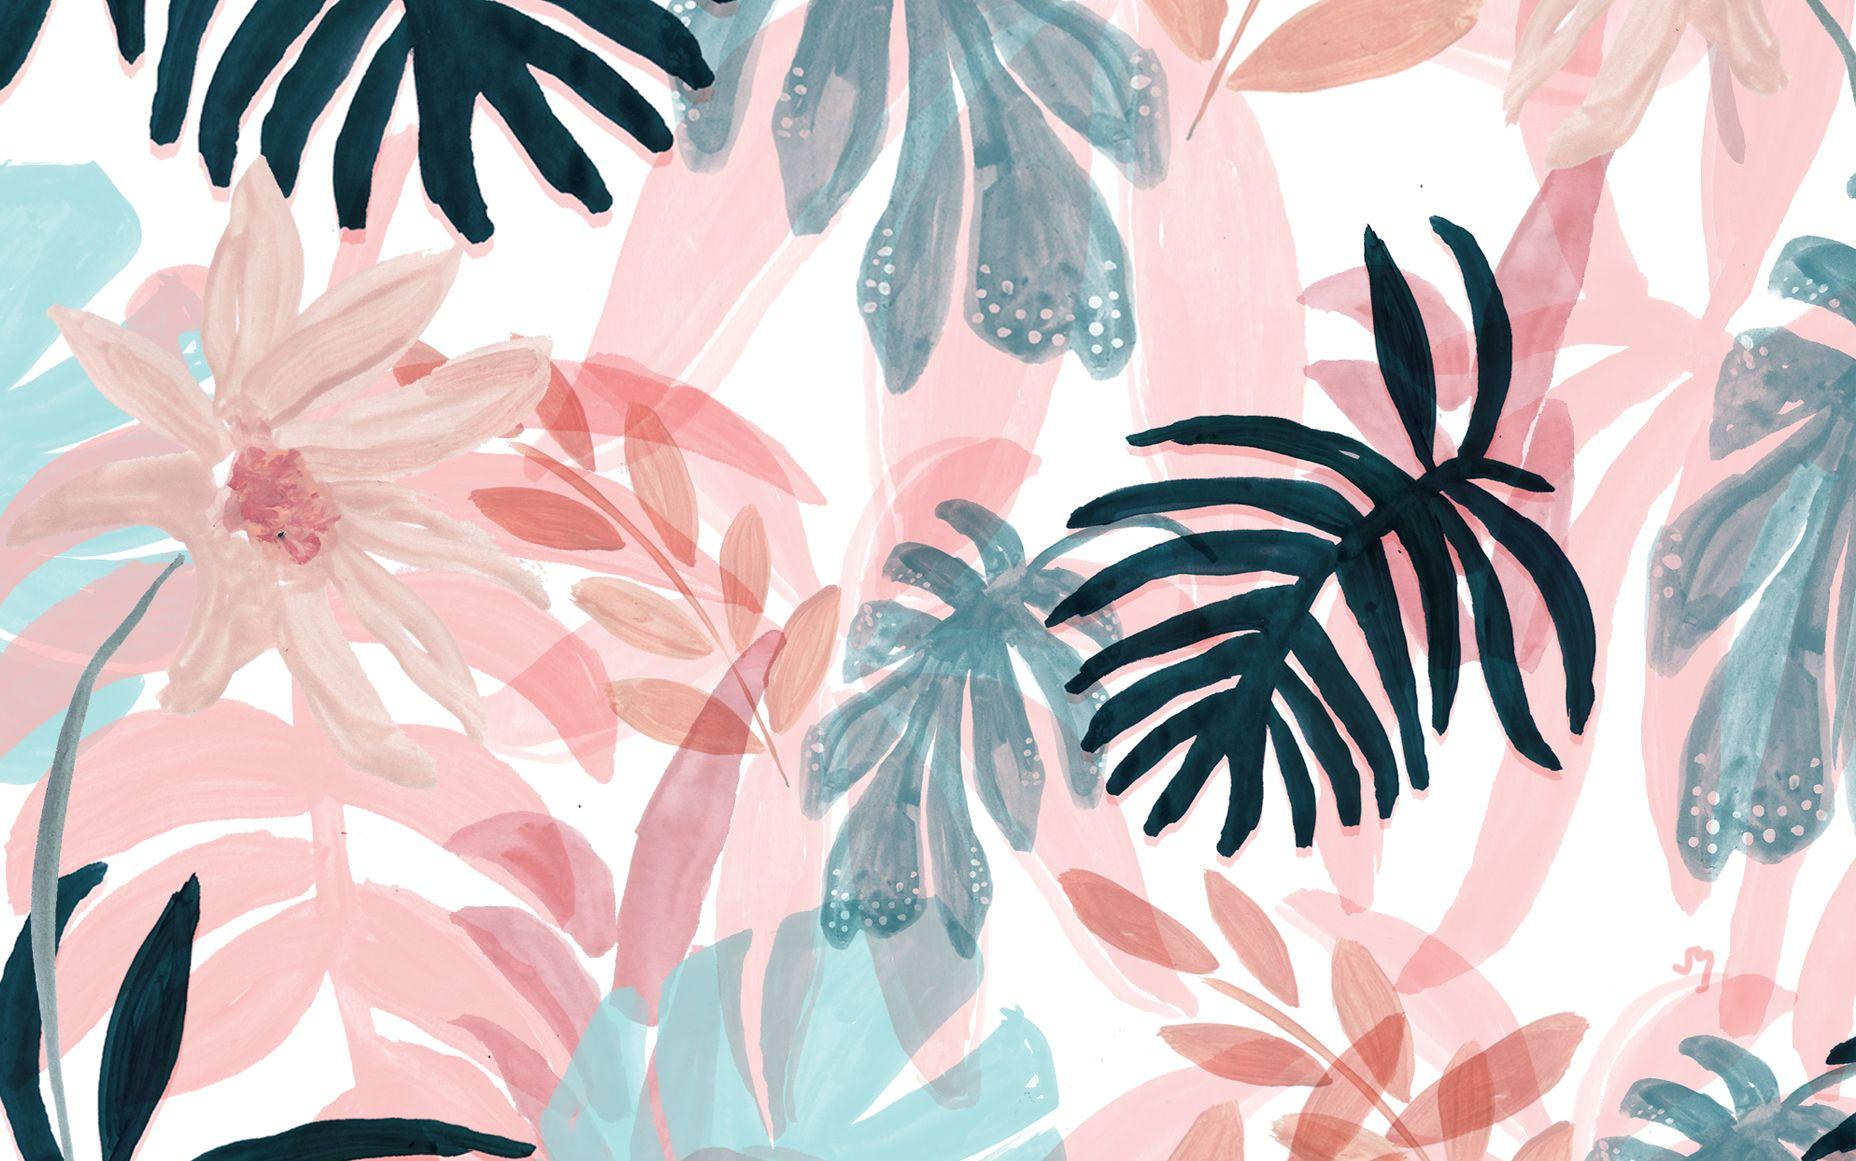 Pink Destop Wallpaper Posted By Ryan Mercado